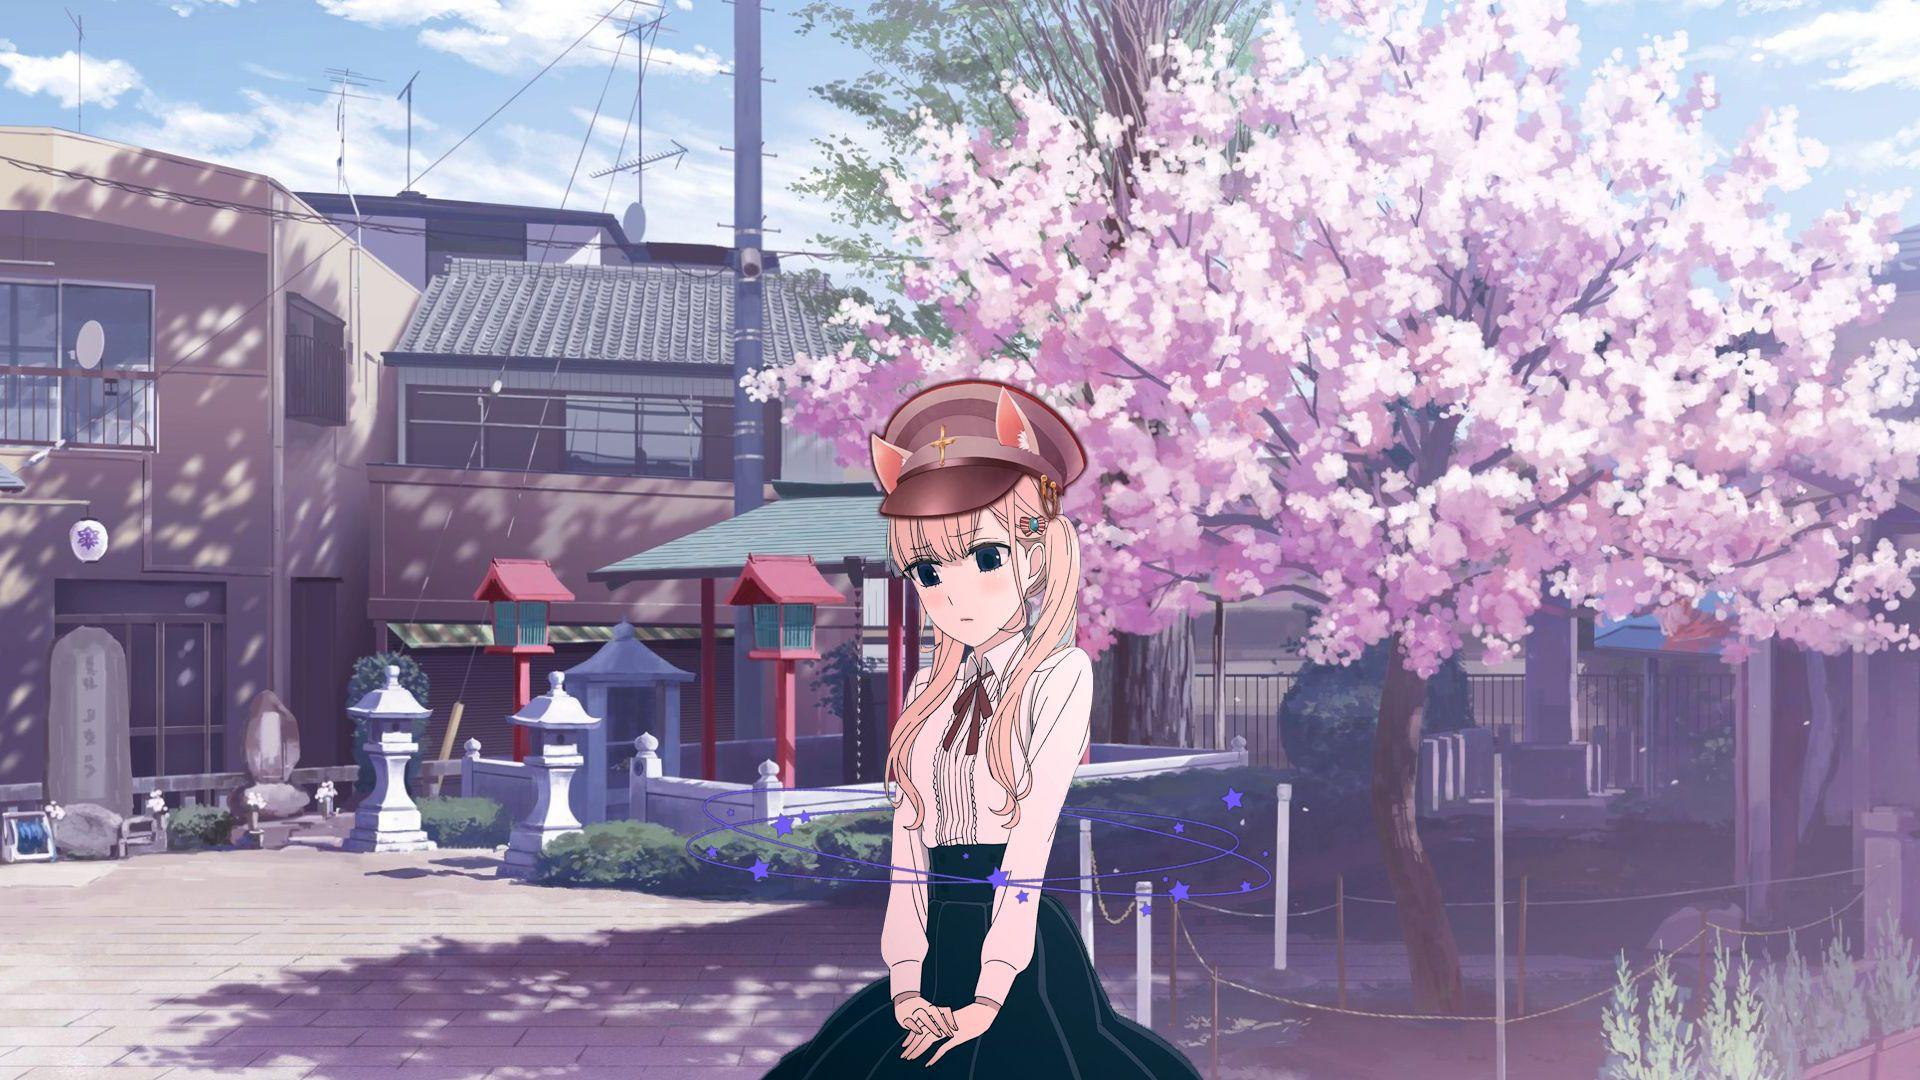 The Photo Of Girl Under The Sakura